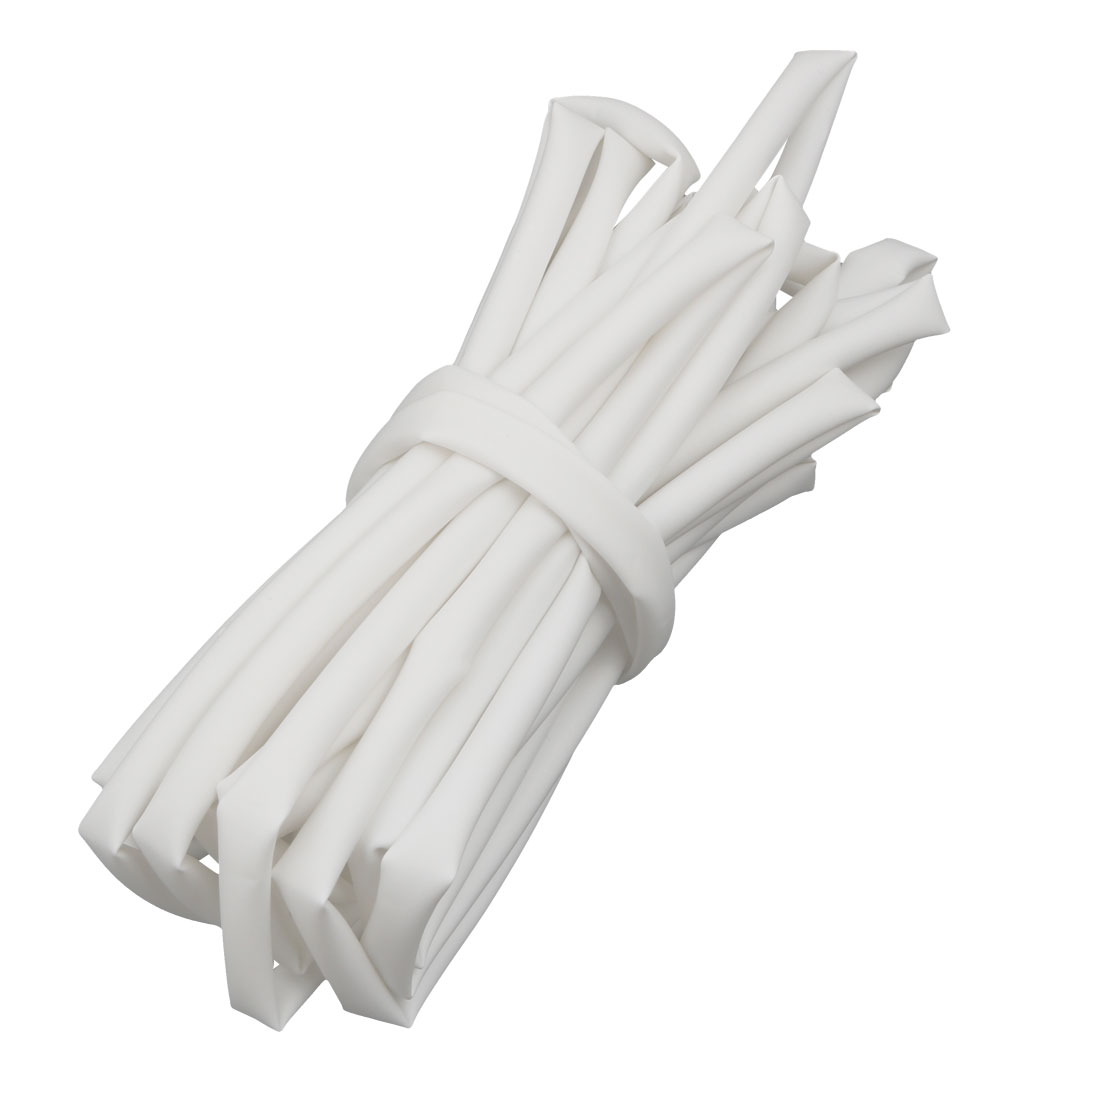 16.4Ft Length 4mm Inner Dia Insulated Heat Shrink Tube Sleeve Wire Wrap White